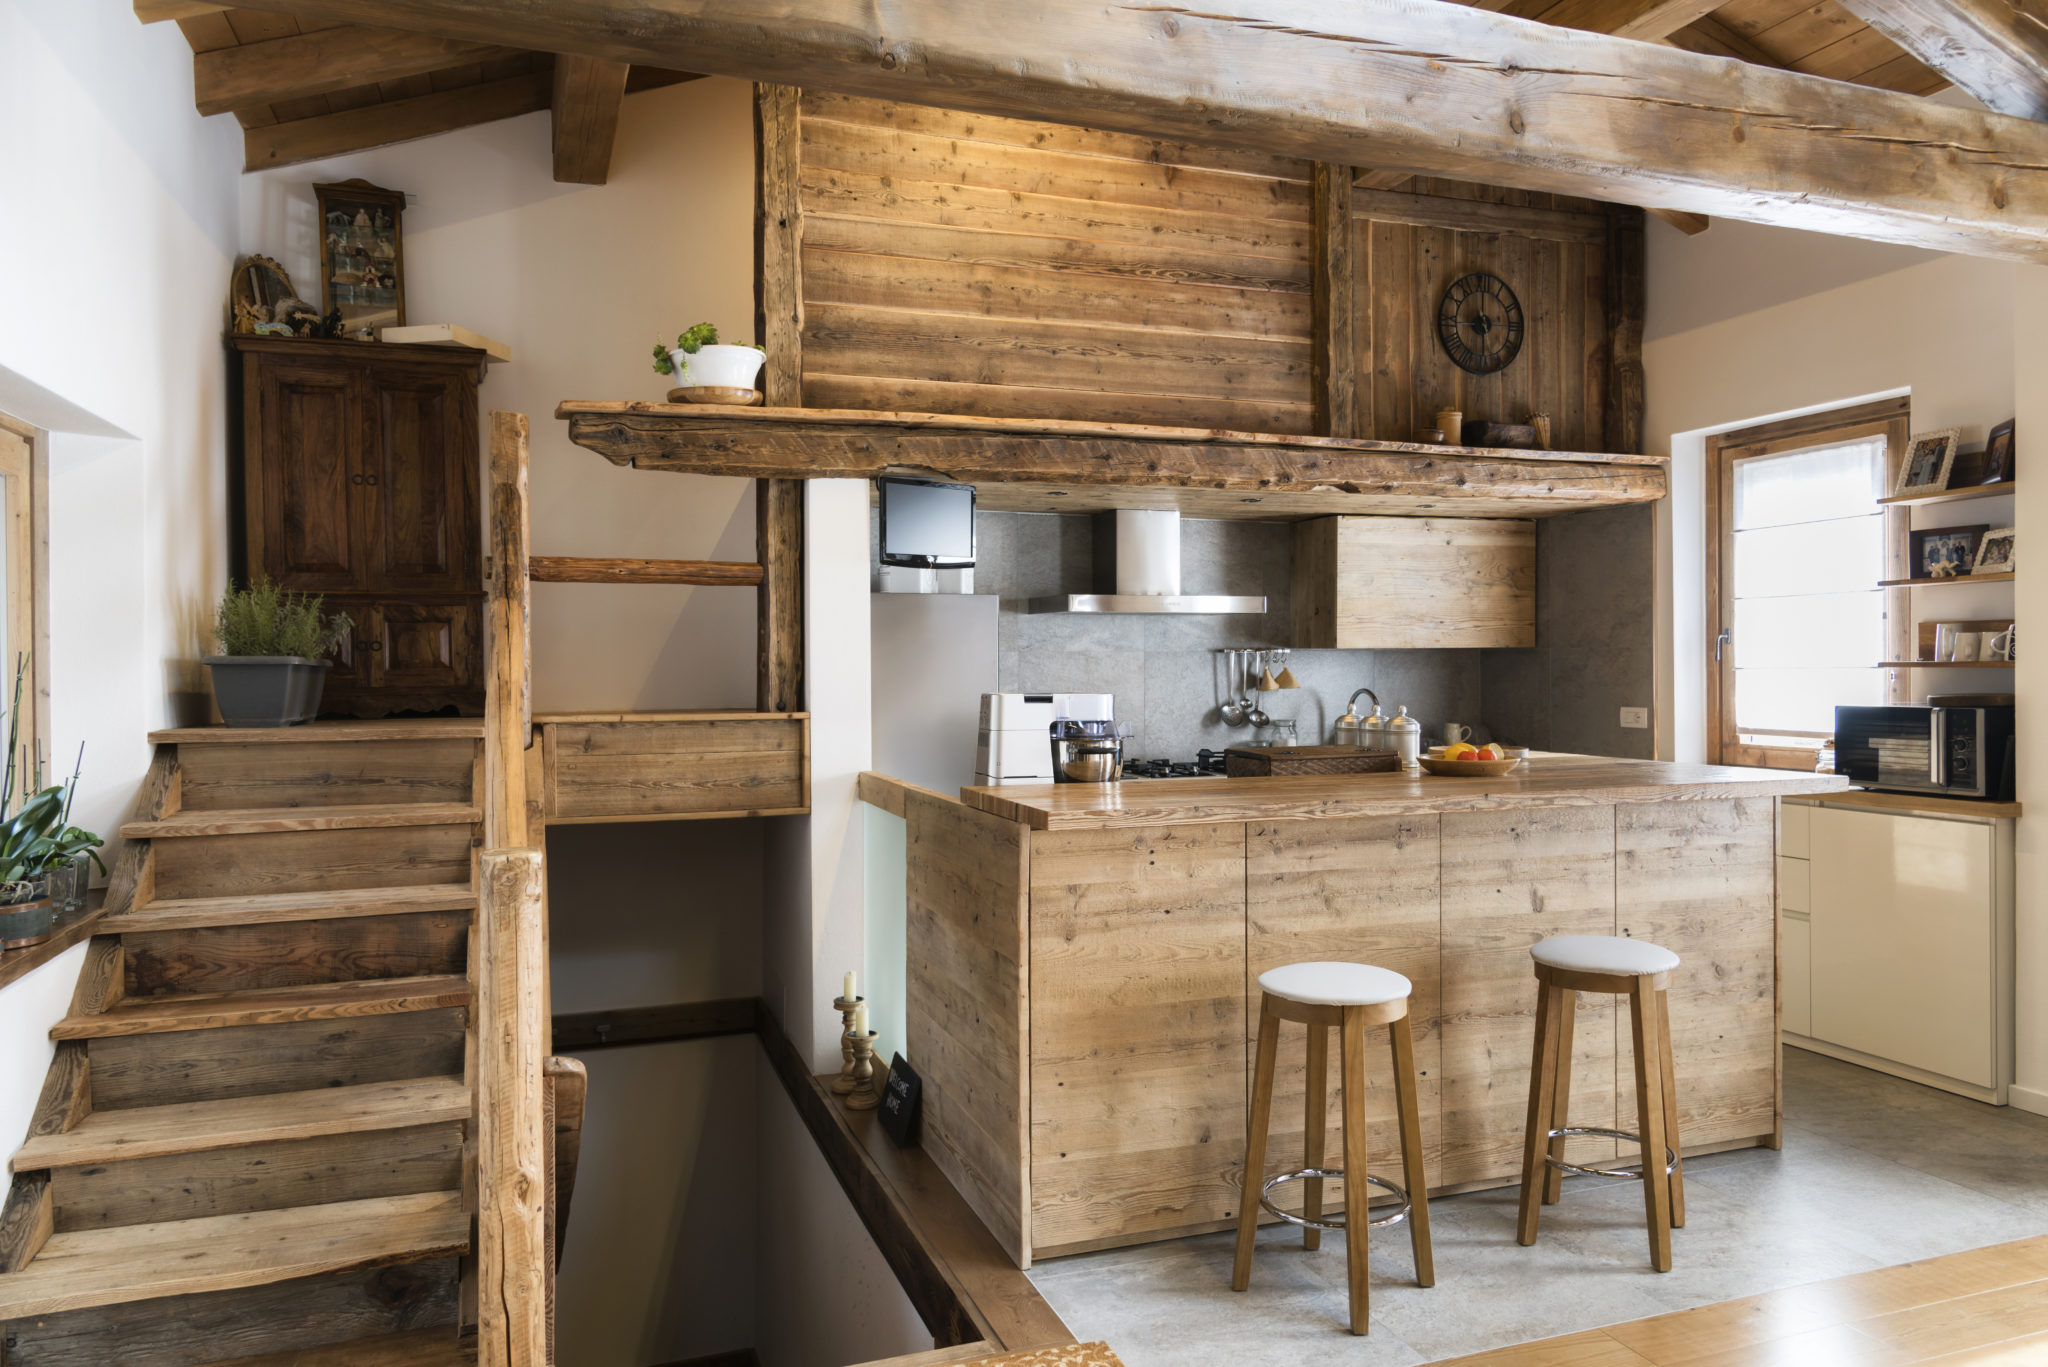 Kitchen Renovation - CasaKeepers LLC